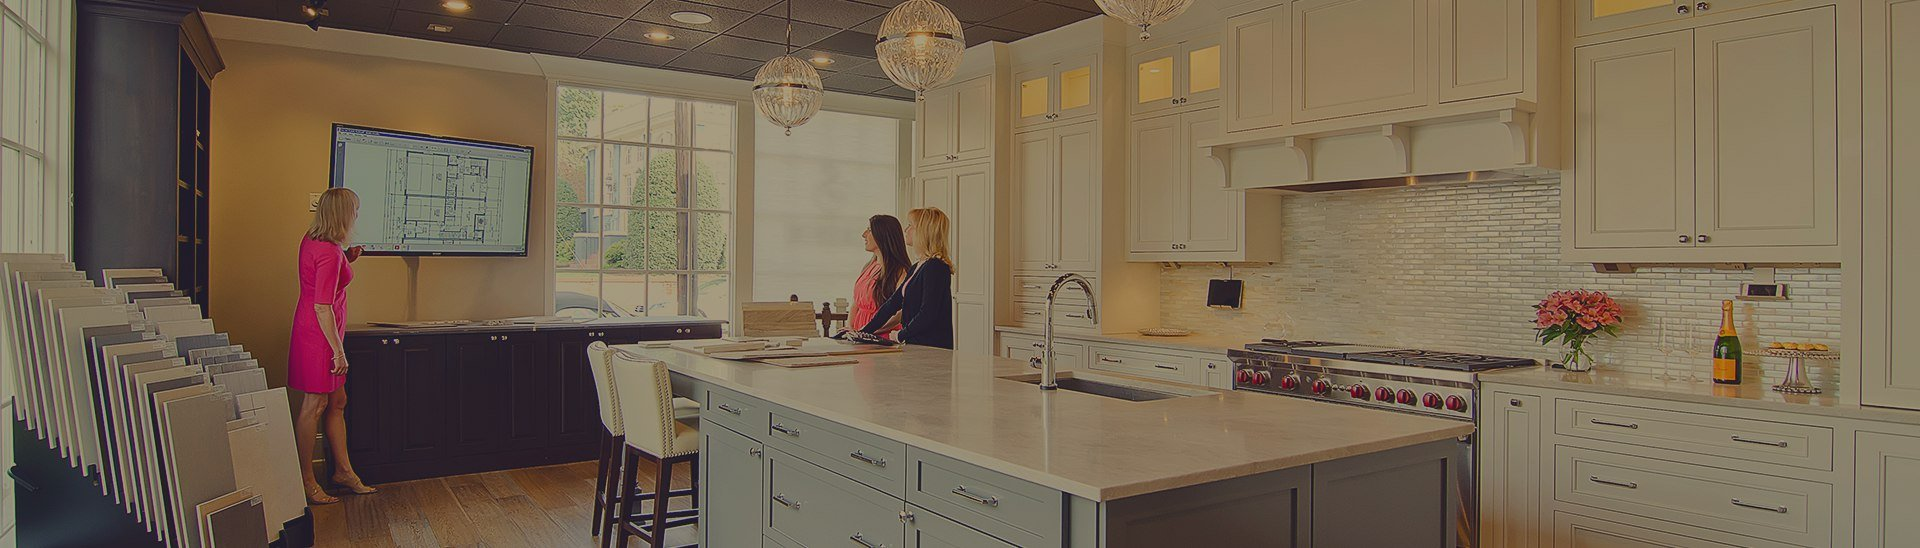 Design-Studio-Simonini-Headers